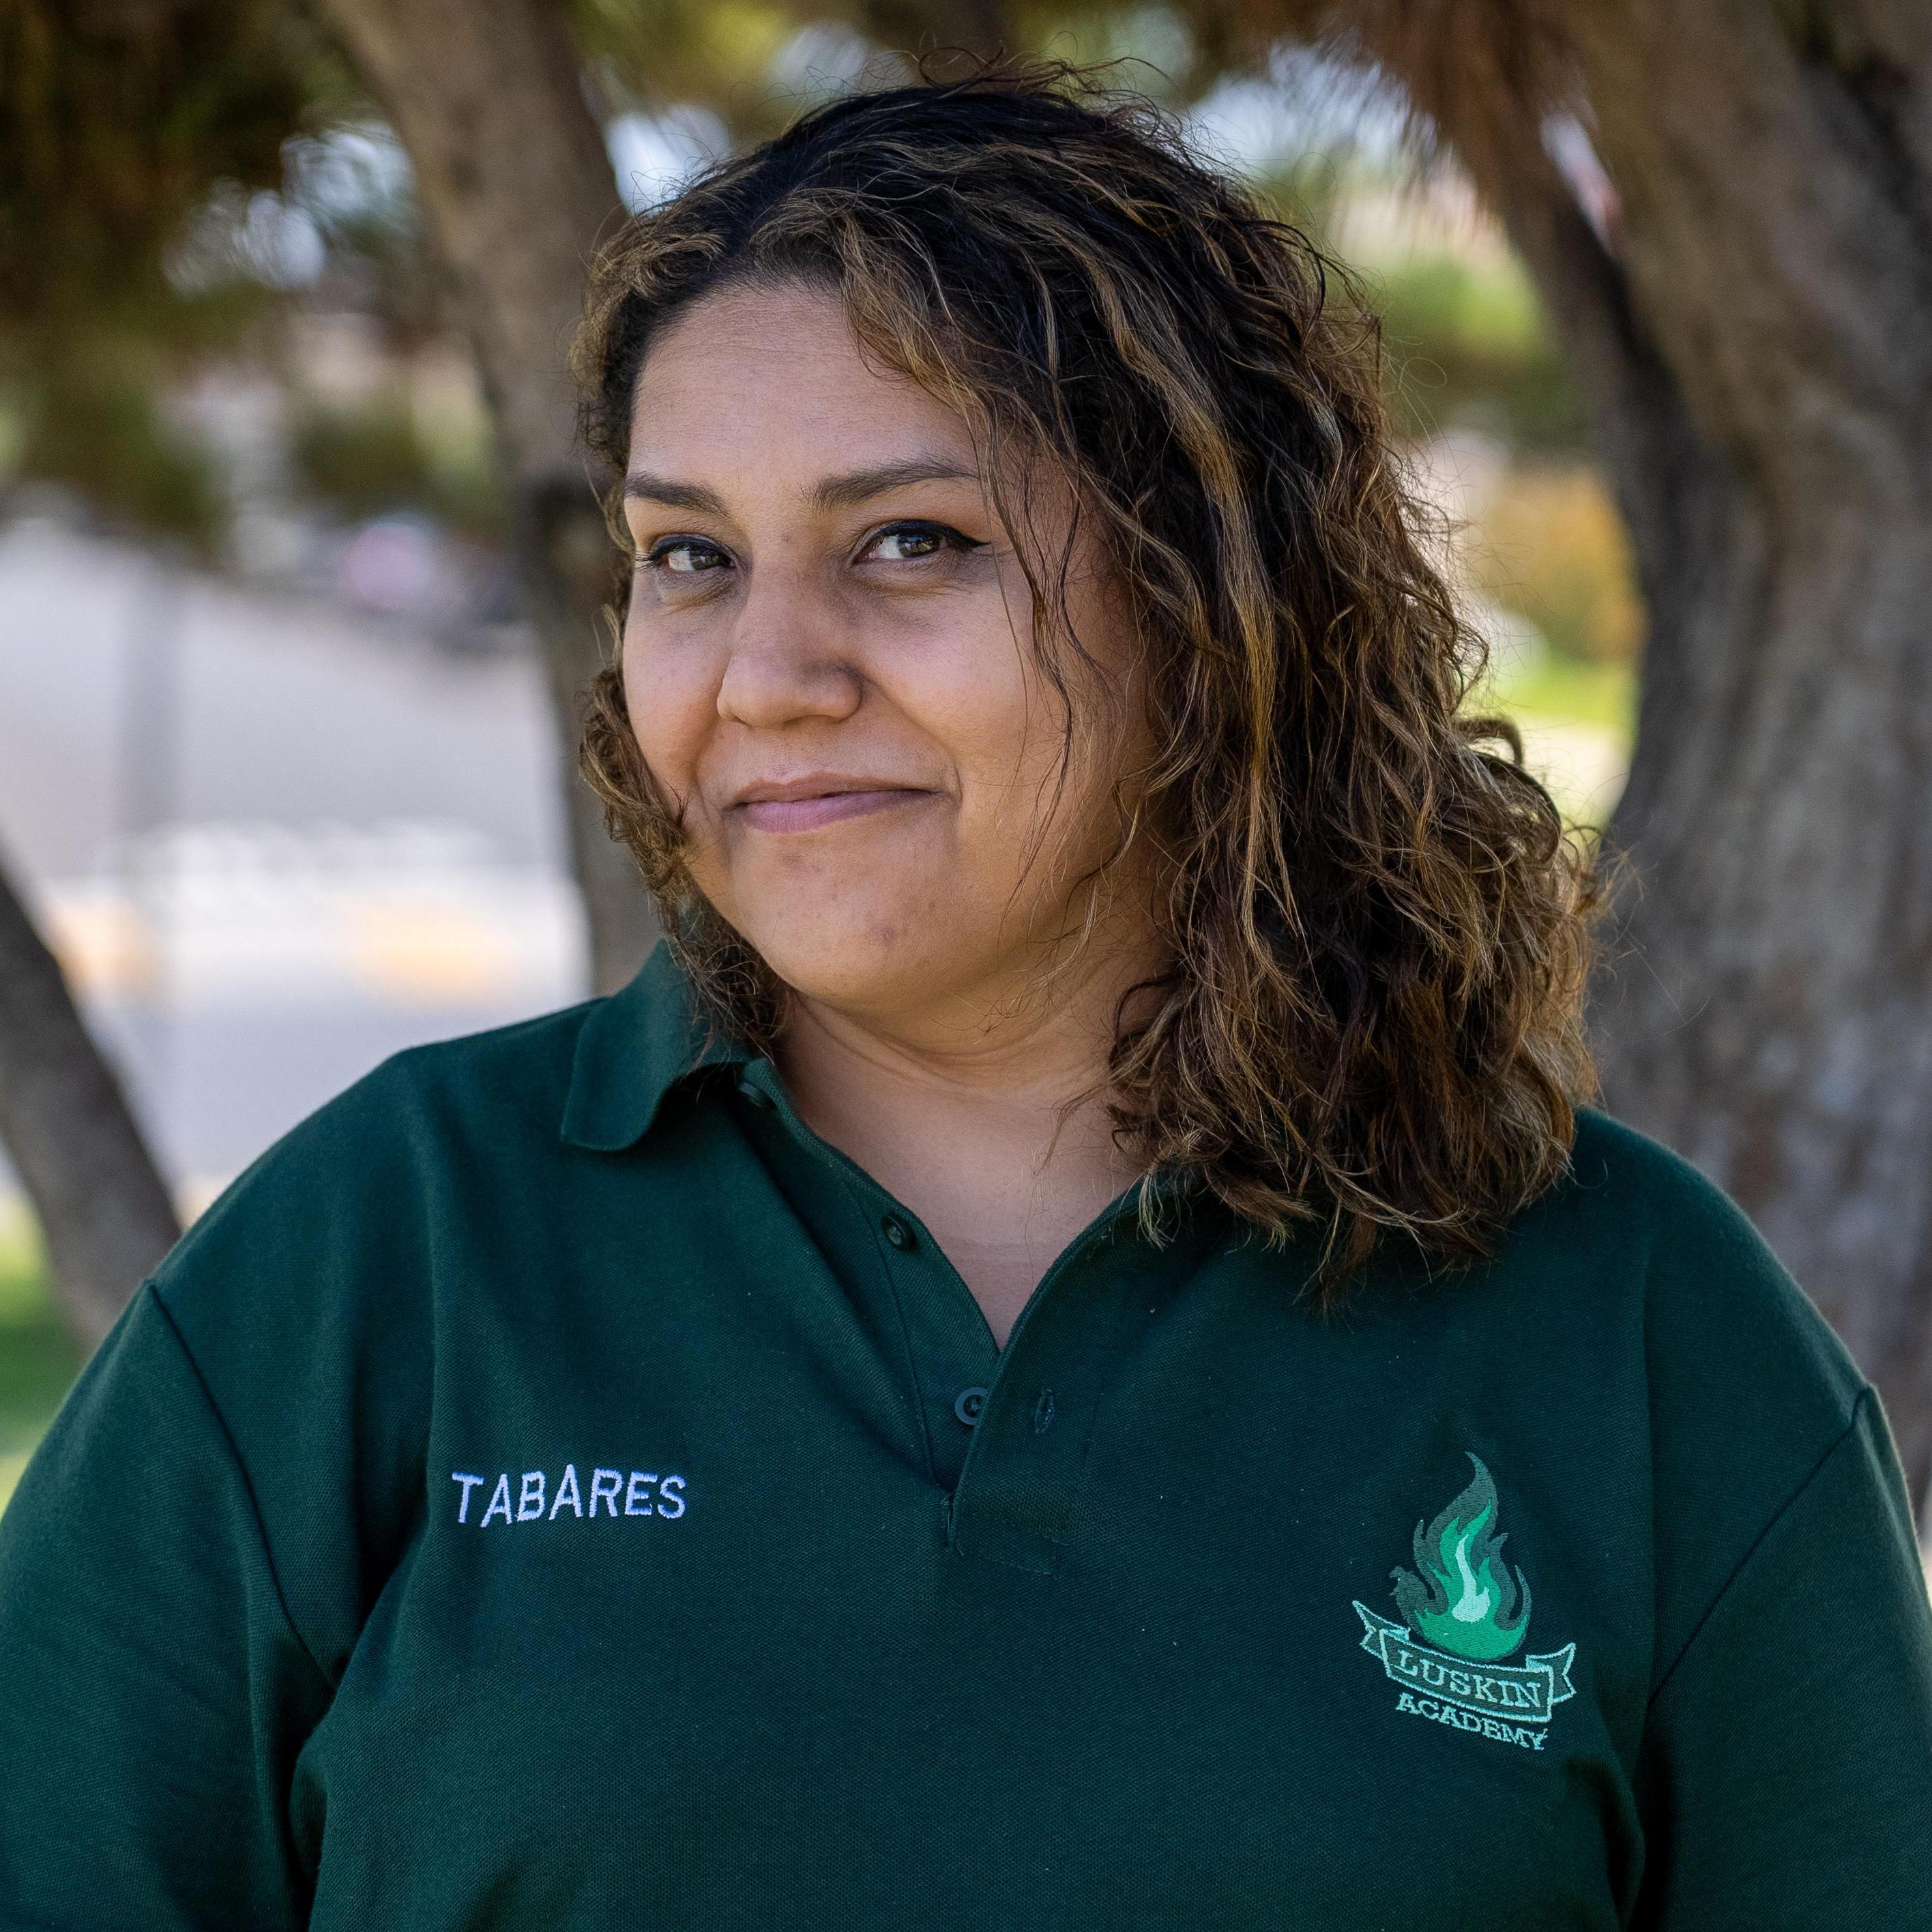 M. Tabares's Profile Photo